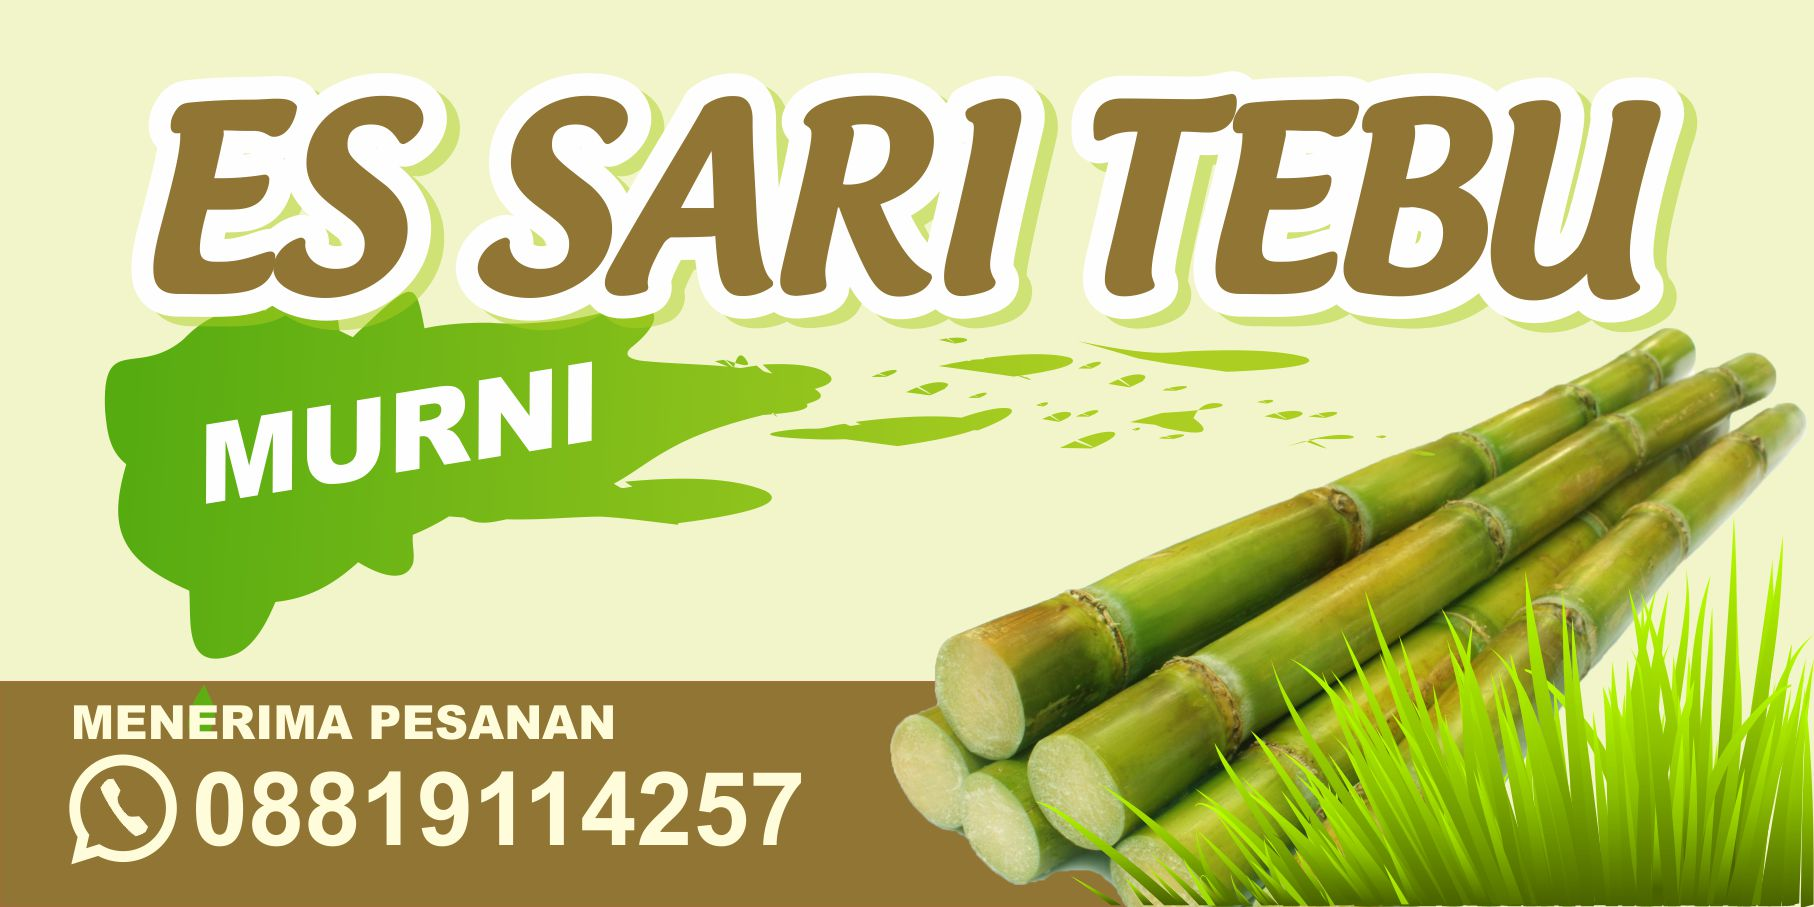 Download Template Desain Banner Es Tebu CDR - Mas Vian